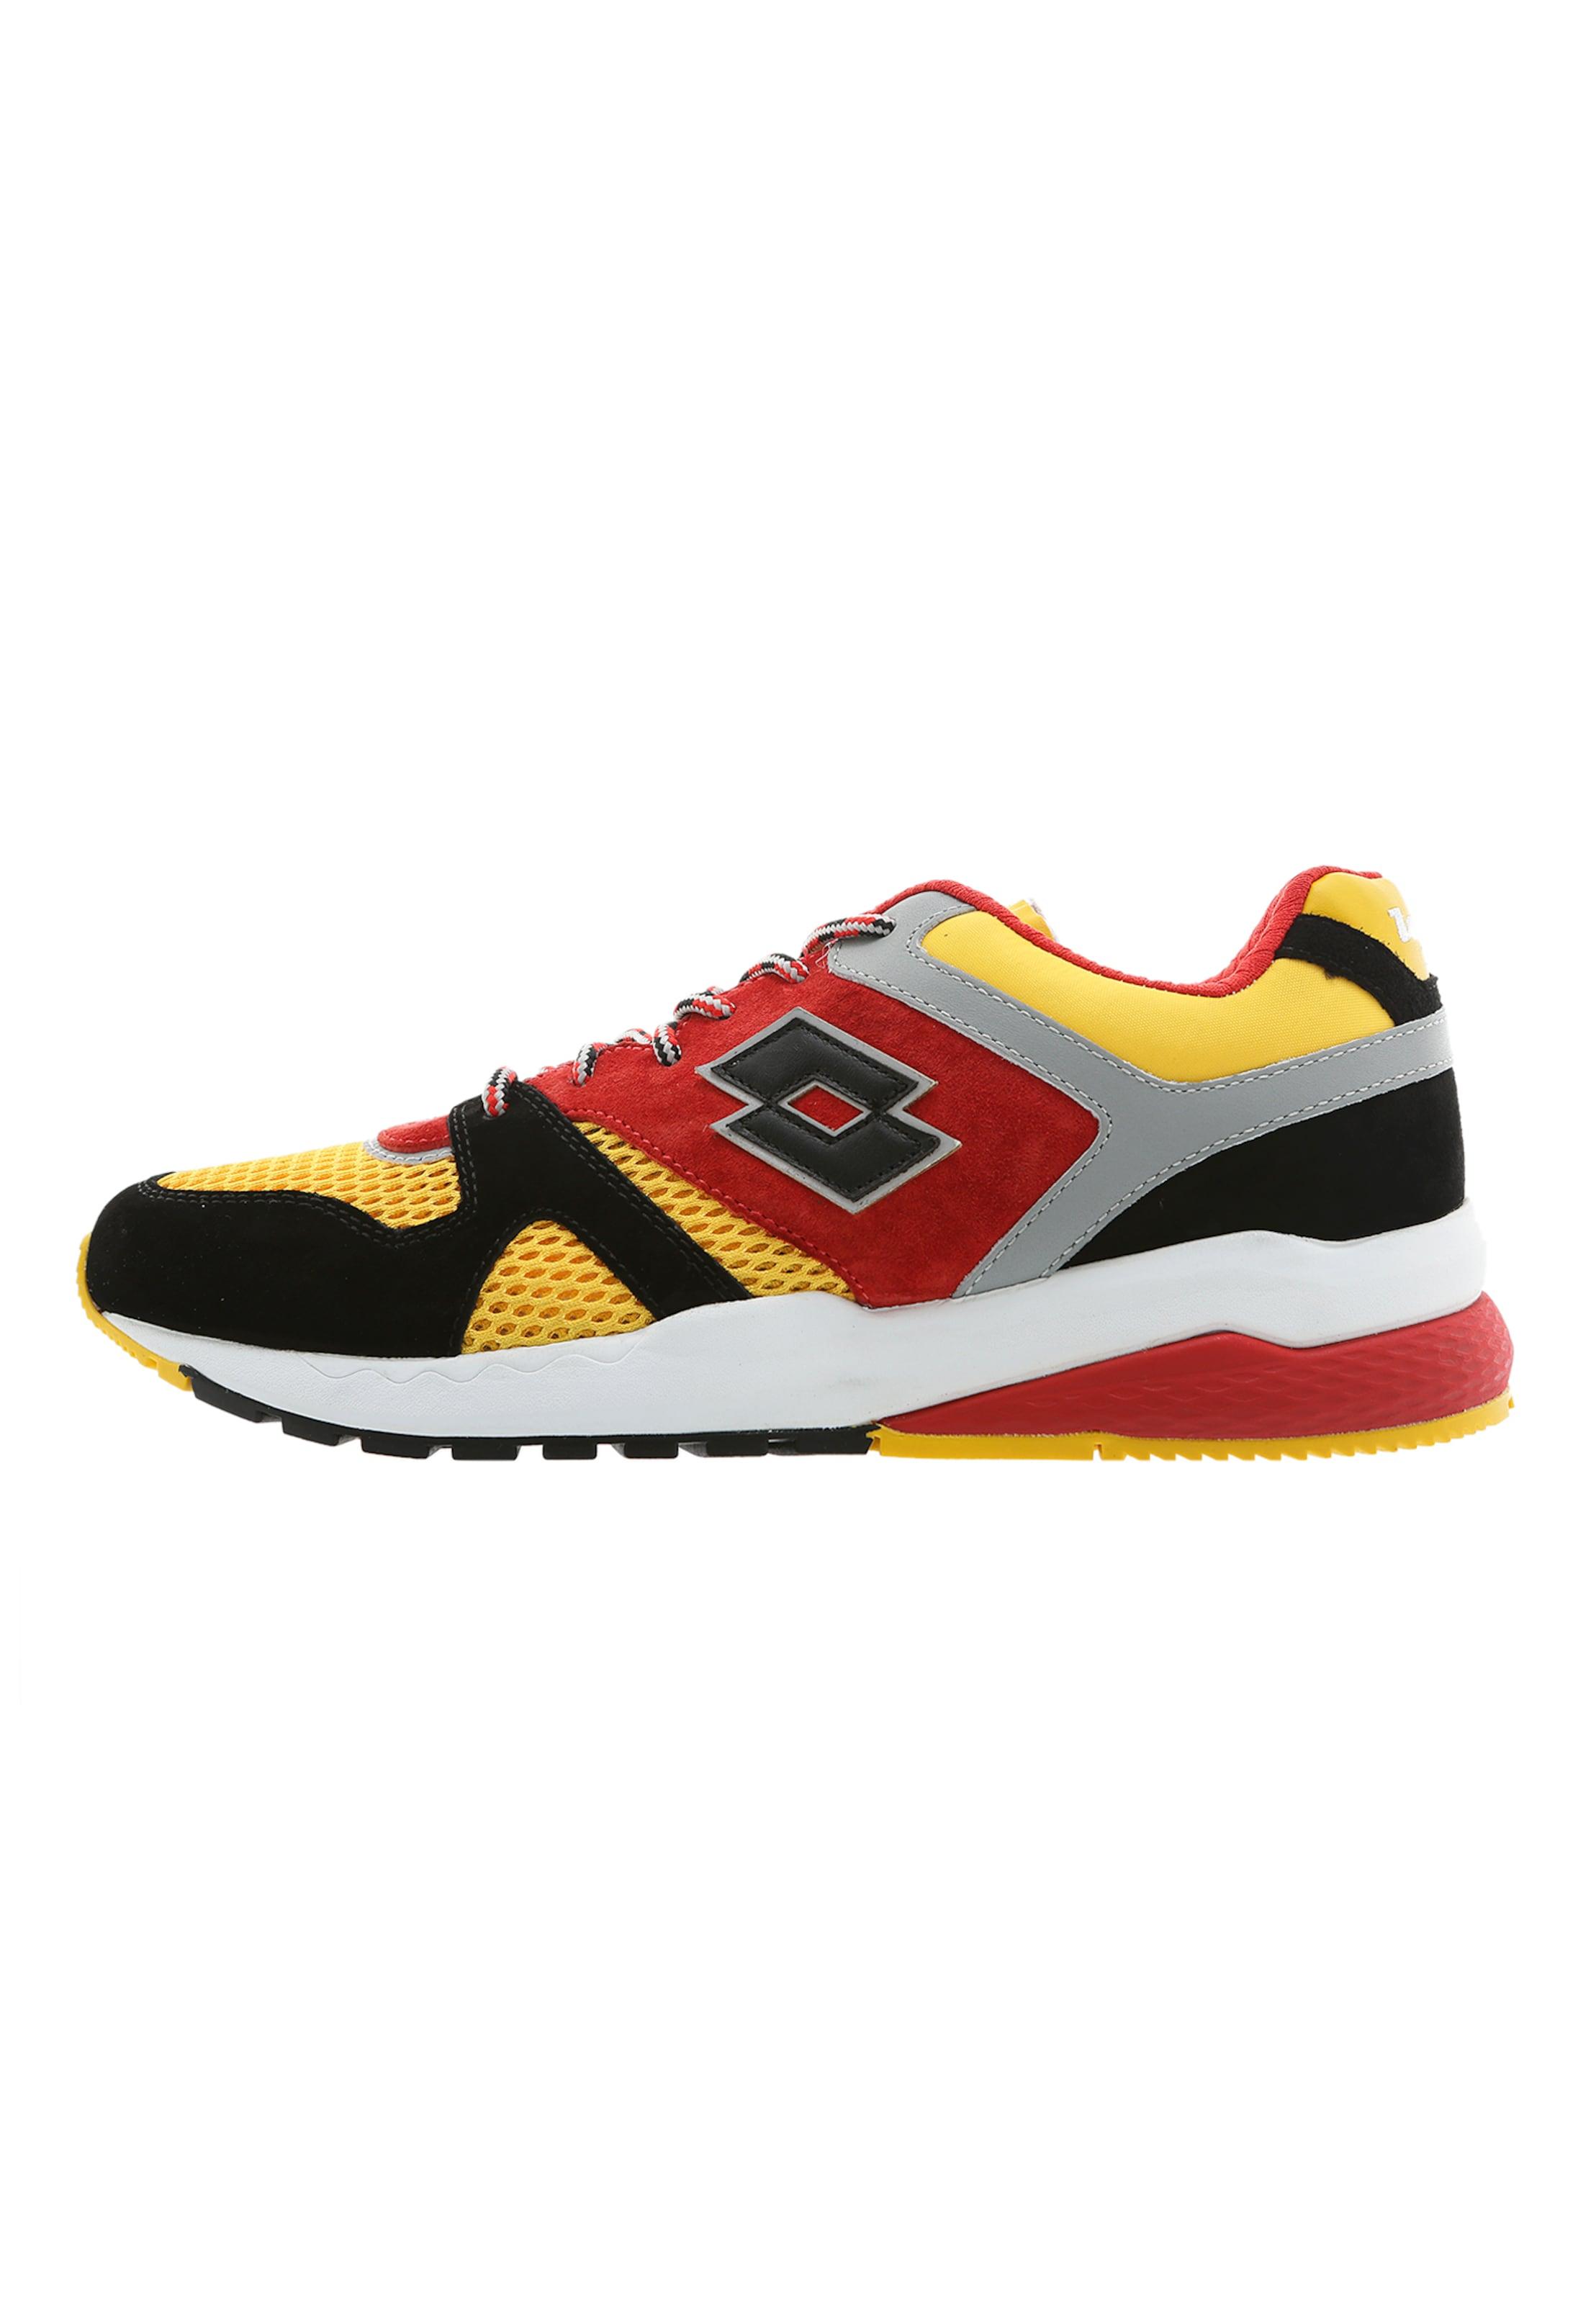 Block' Rot 'marathon In GelbGraumeliert Sneaker Lotto Leggenda Schwarz EDH29I